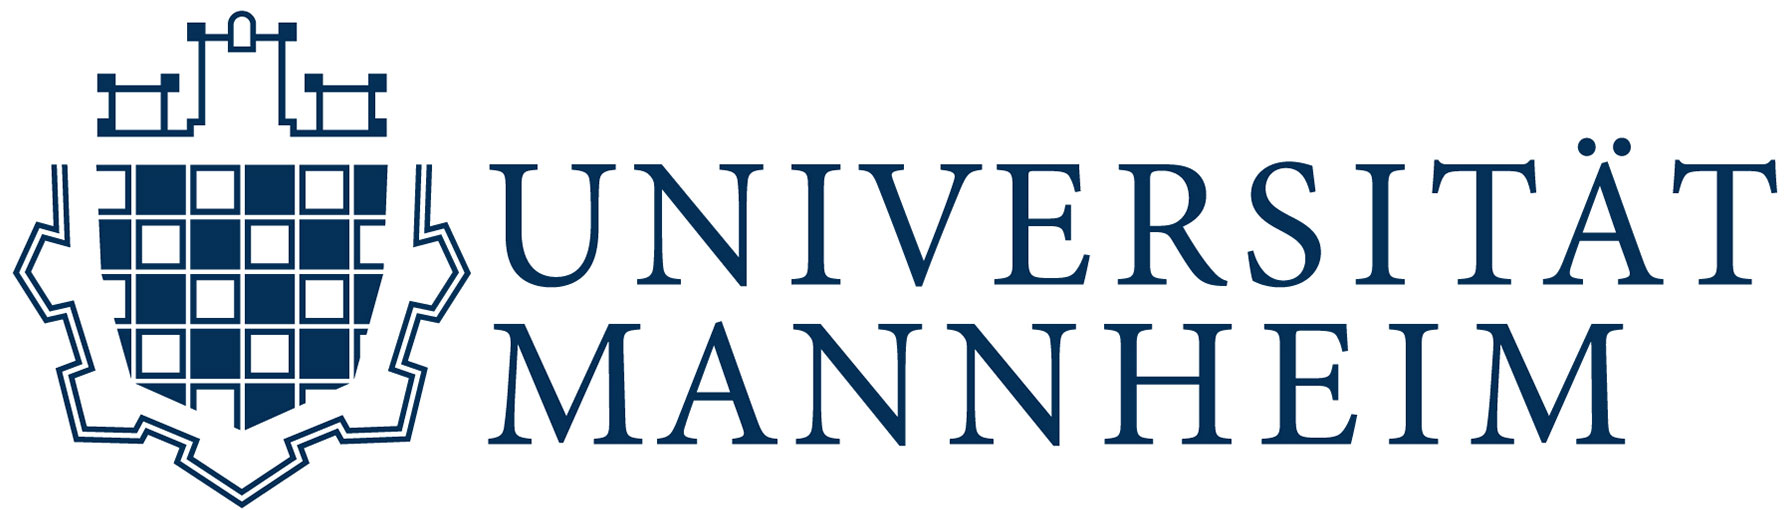 Projektmitarbeiter (m/w/d) - Universität Mannheim (UMA) - Logo